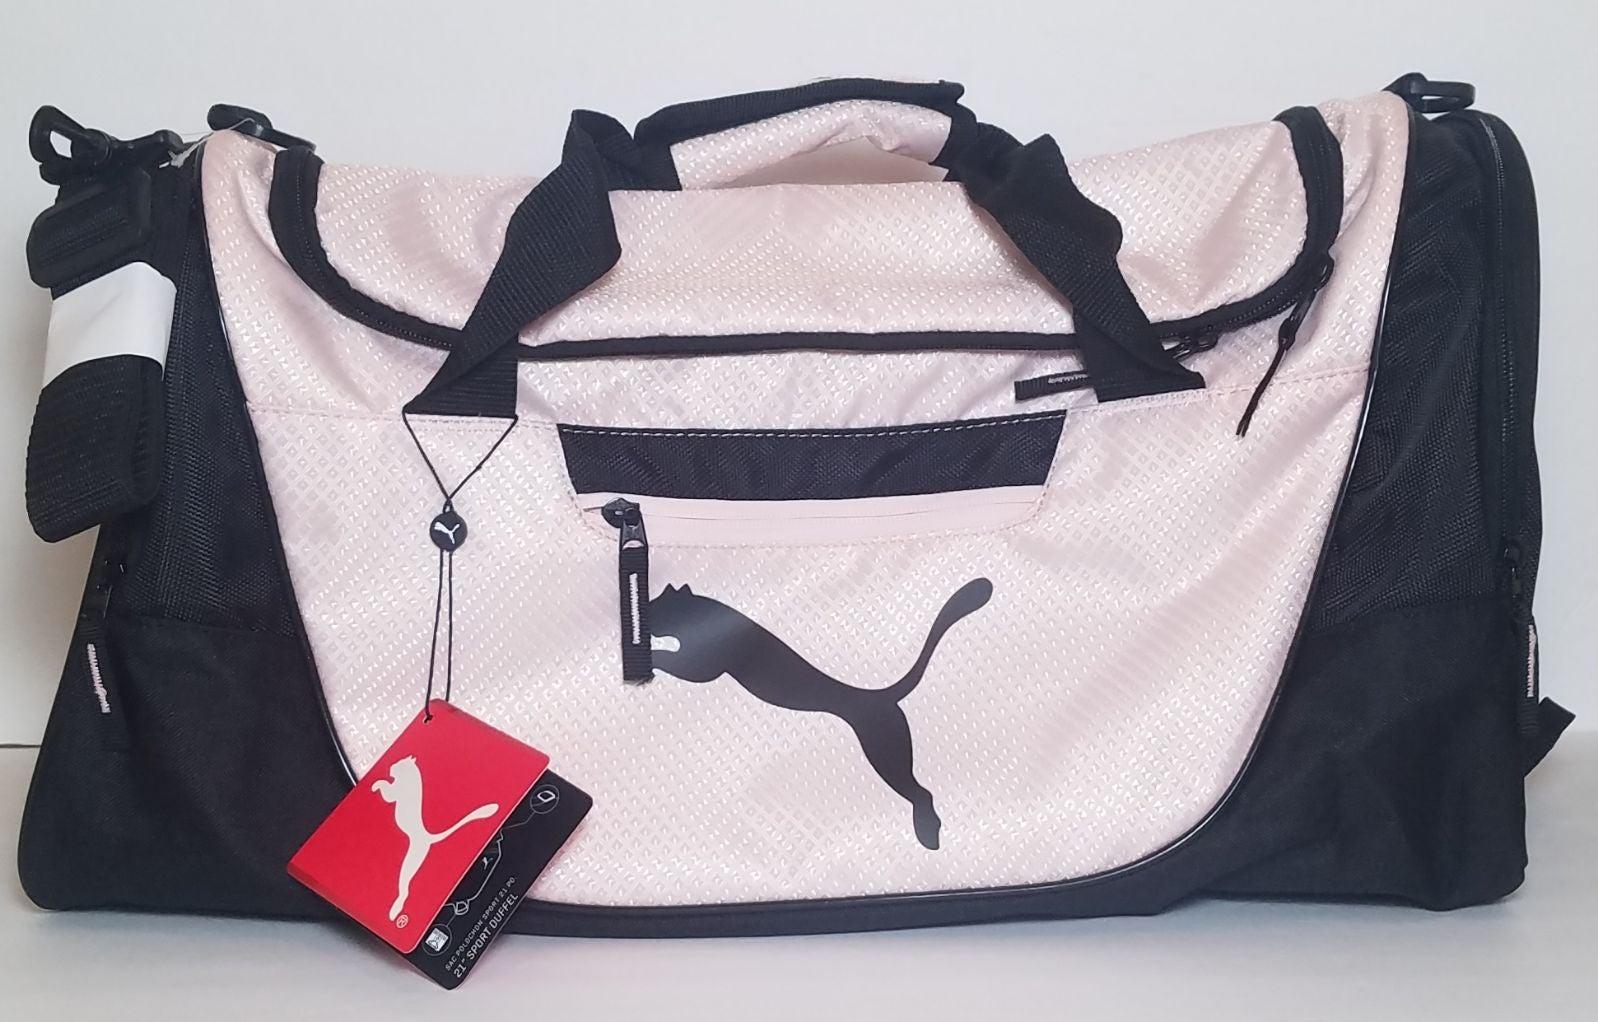 Puma Candidate Sport Duffel Bag Pink Blk